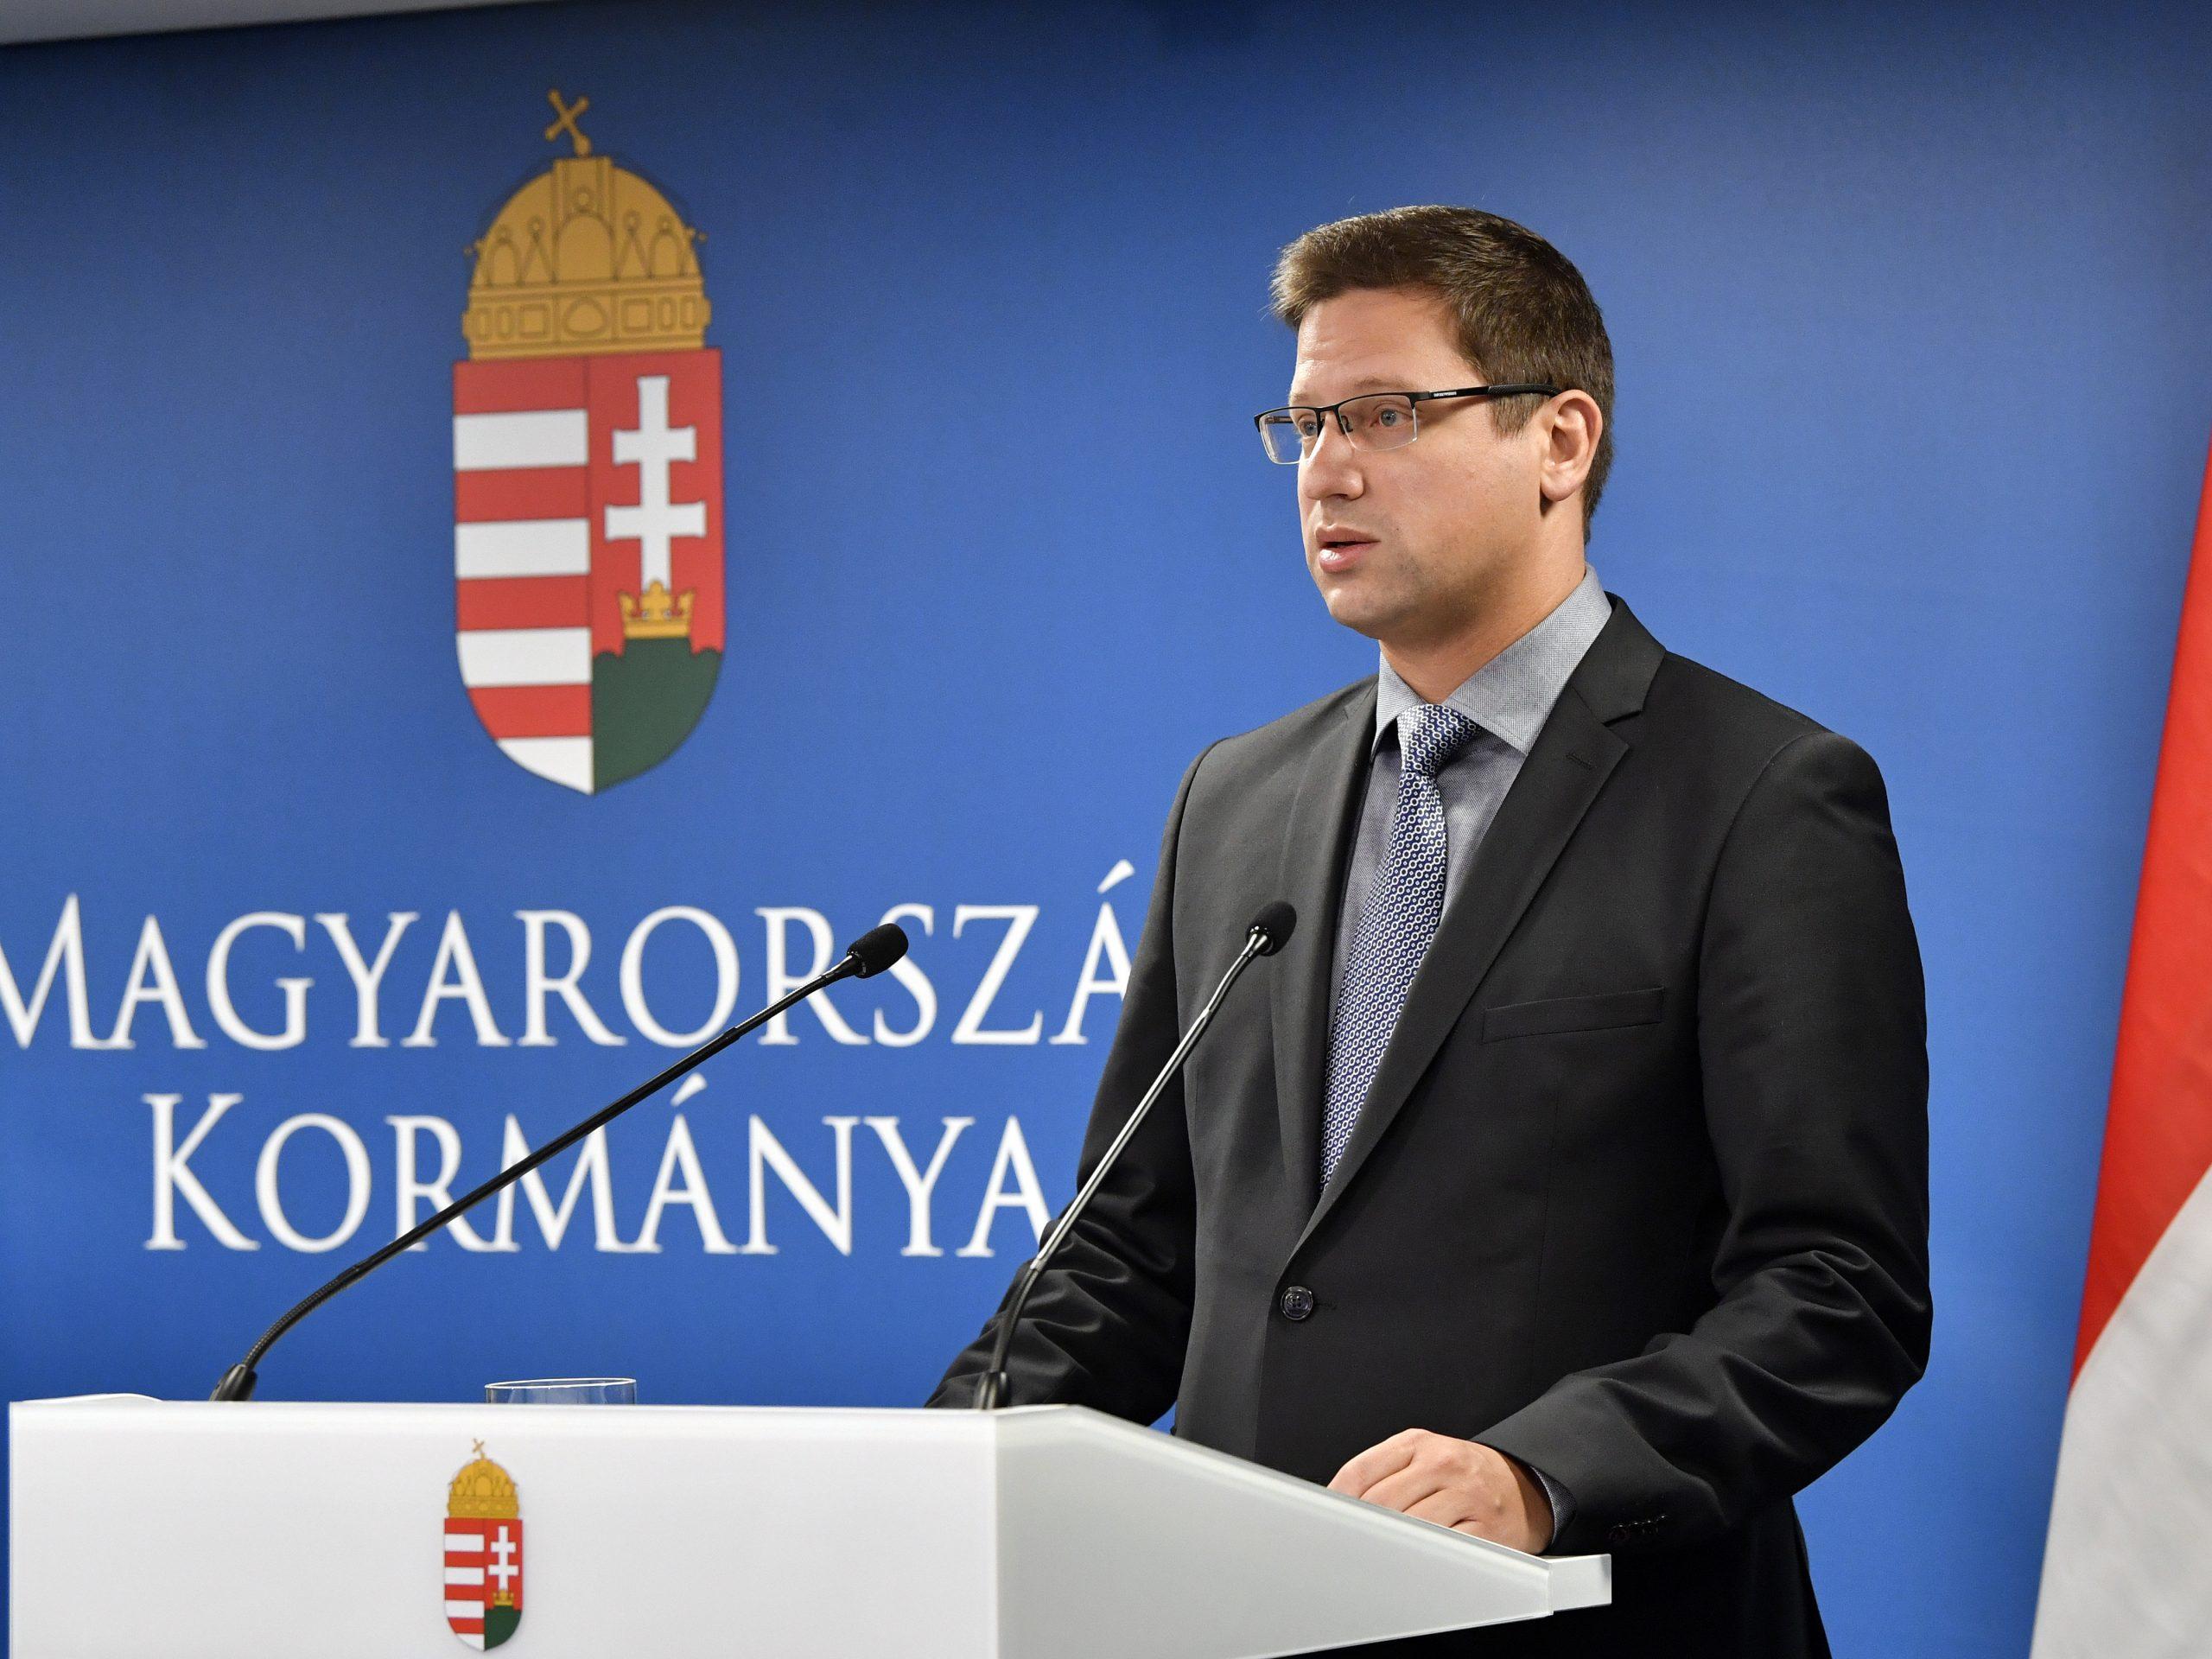 PMO Head: Poland Top Court Decision 'Misinterpreted'